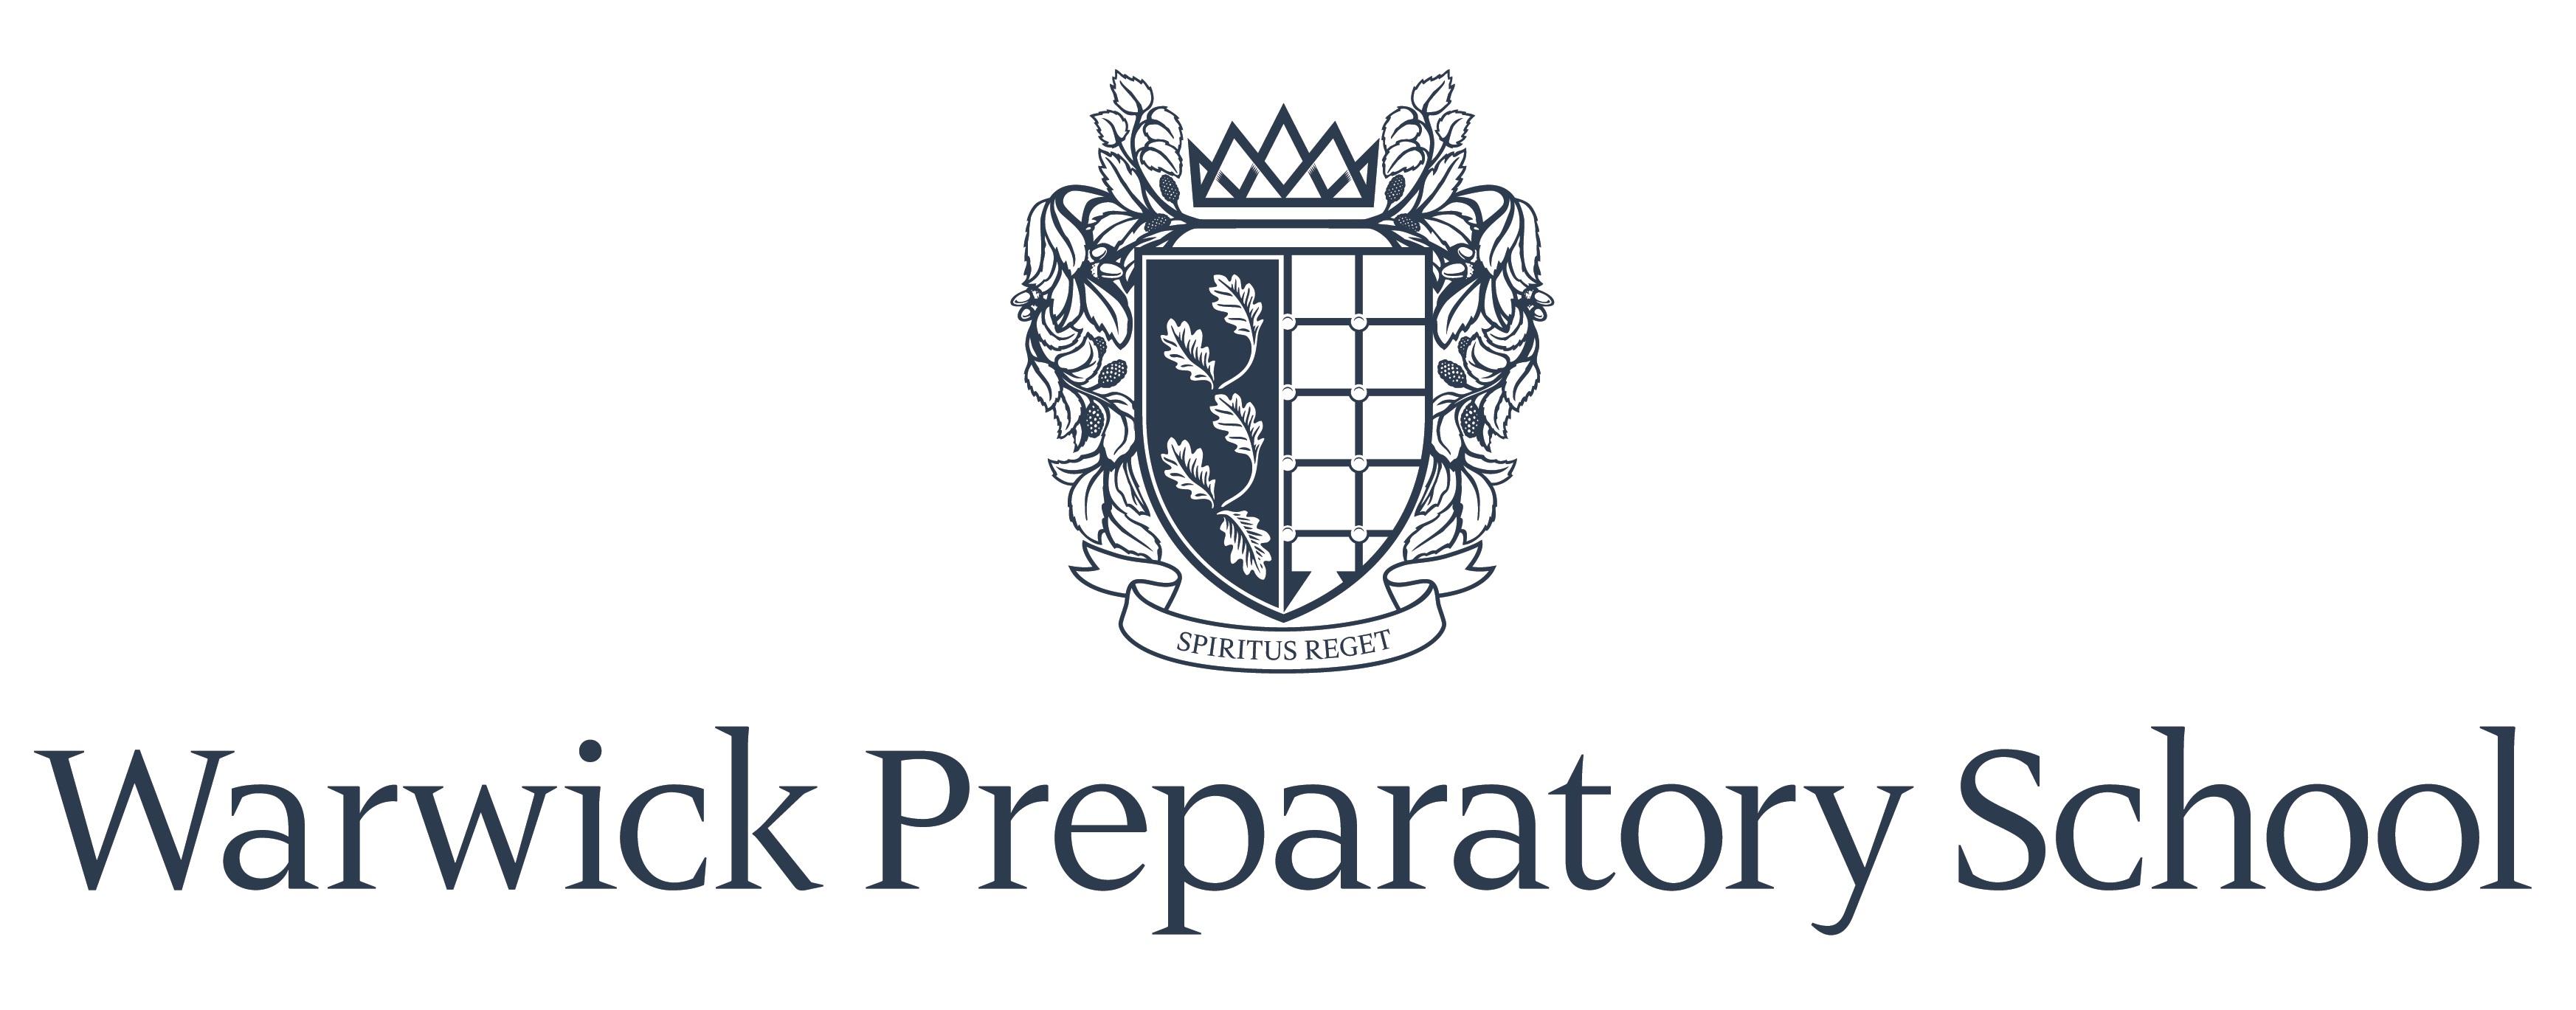 Warwick Preparatory School's logo